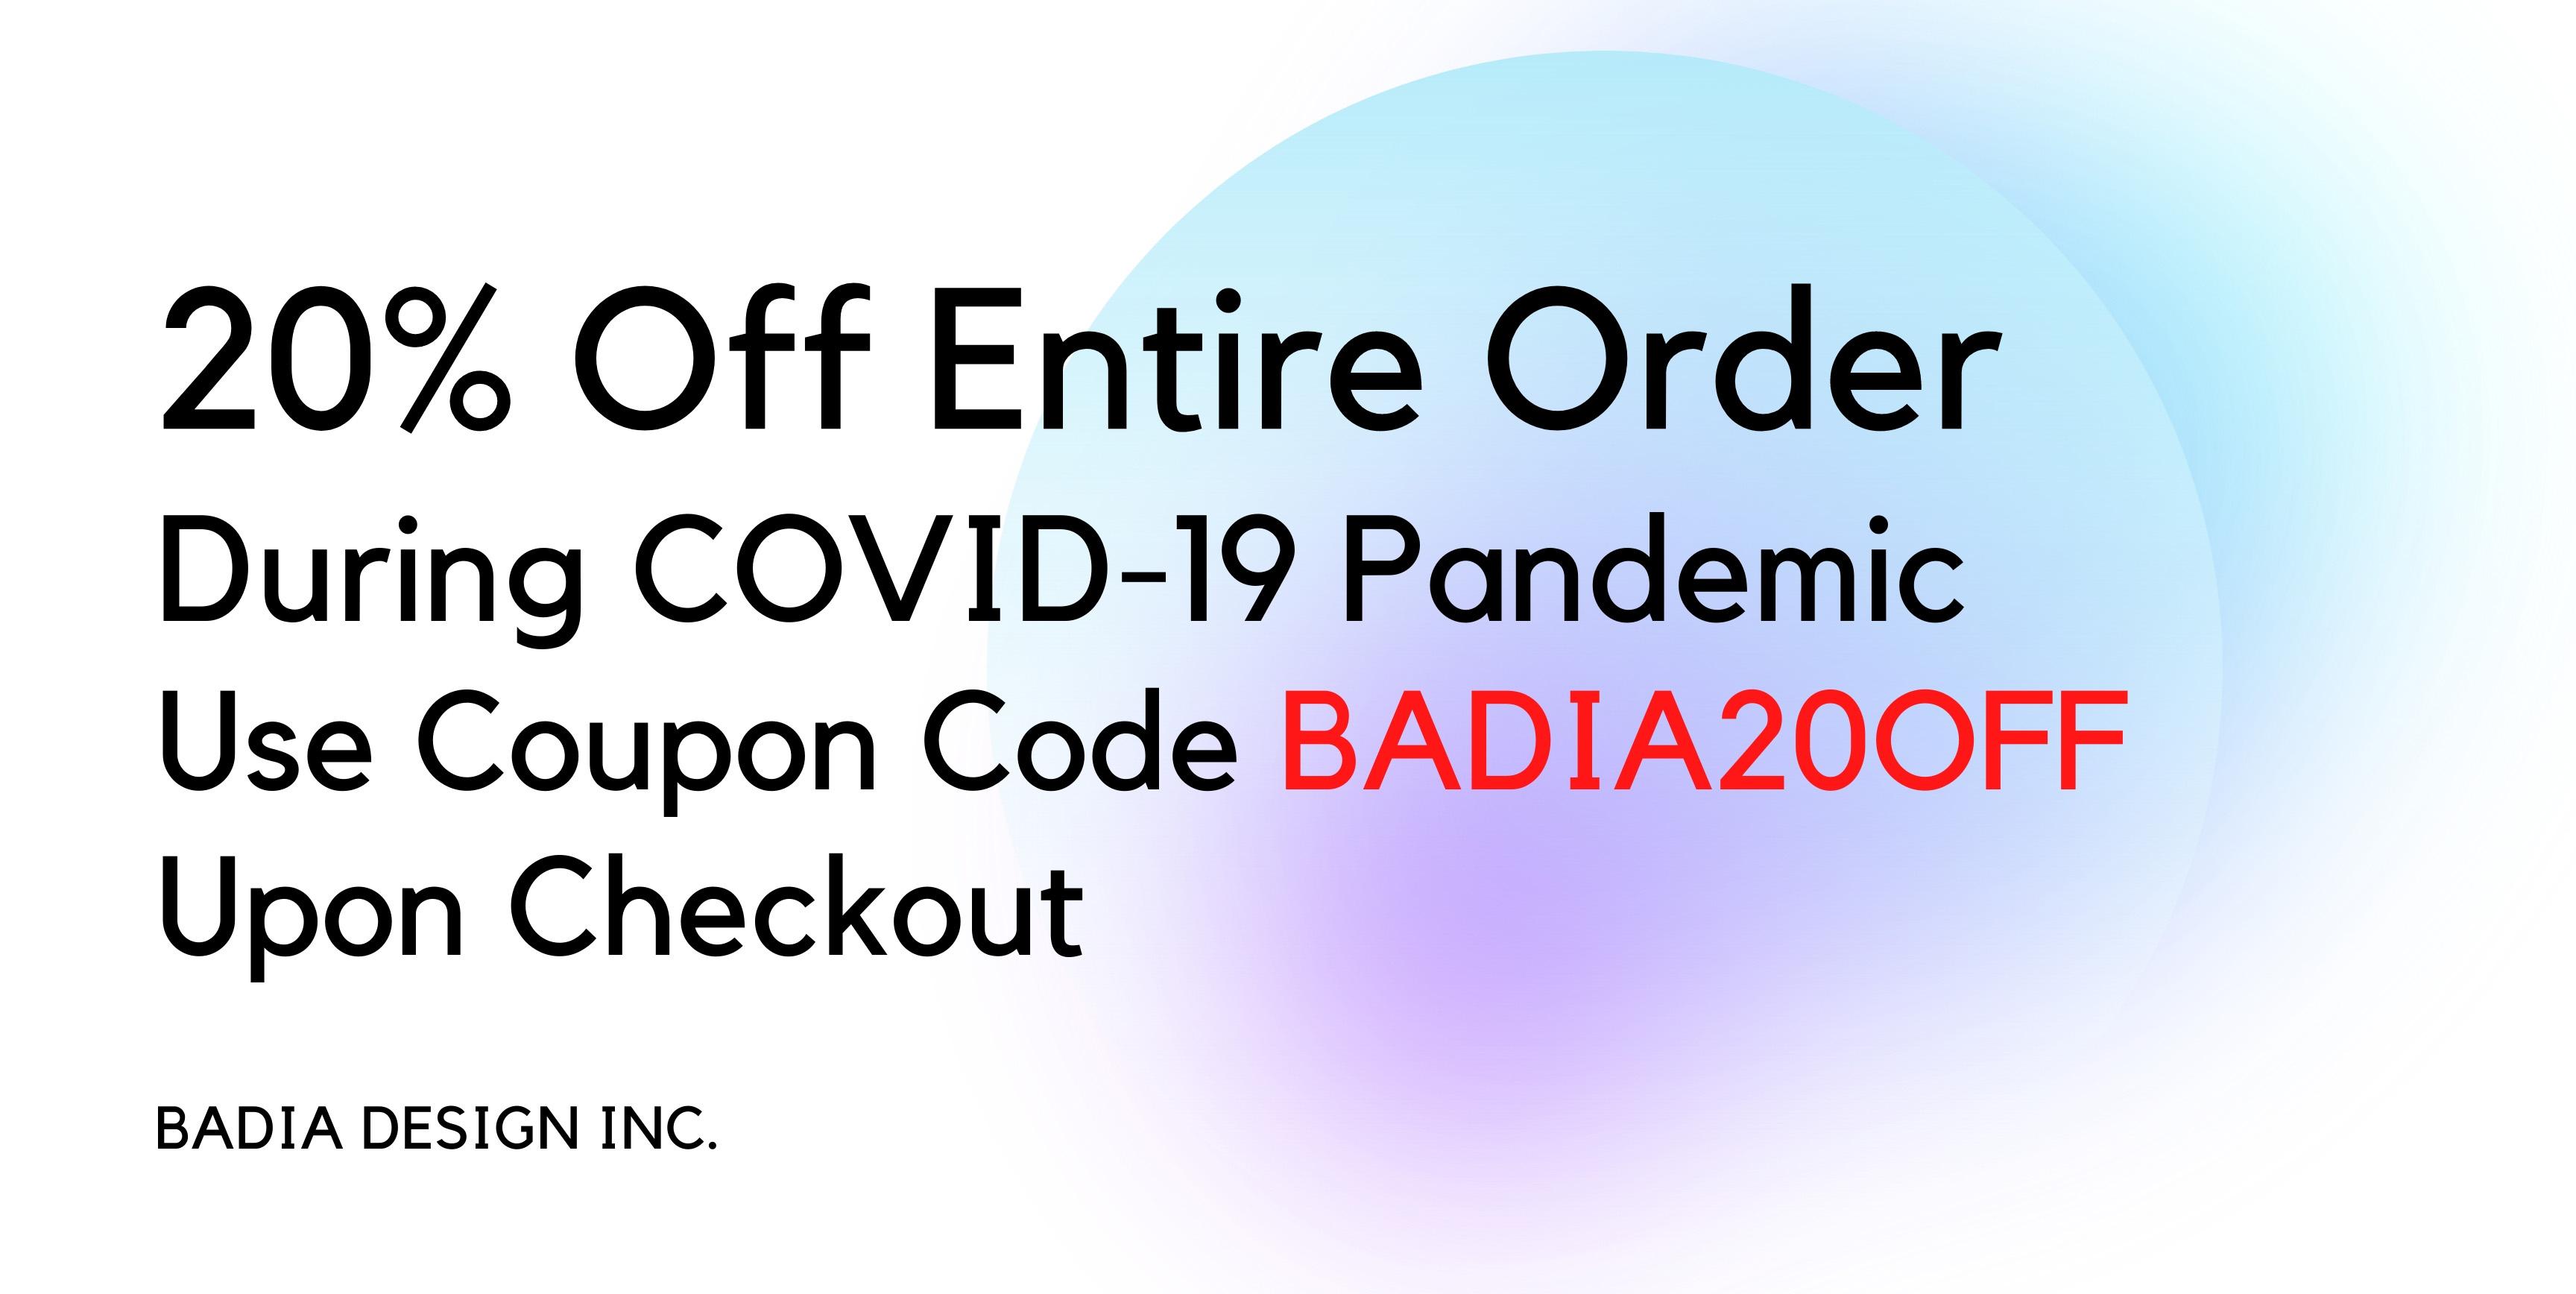 badia-design-covid-19-storewide-sale.jpg